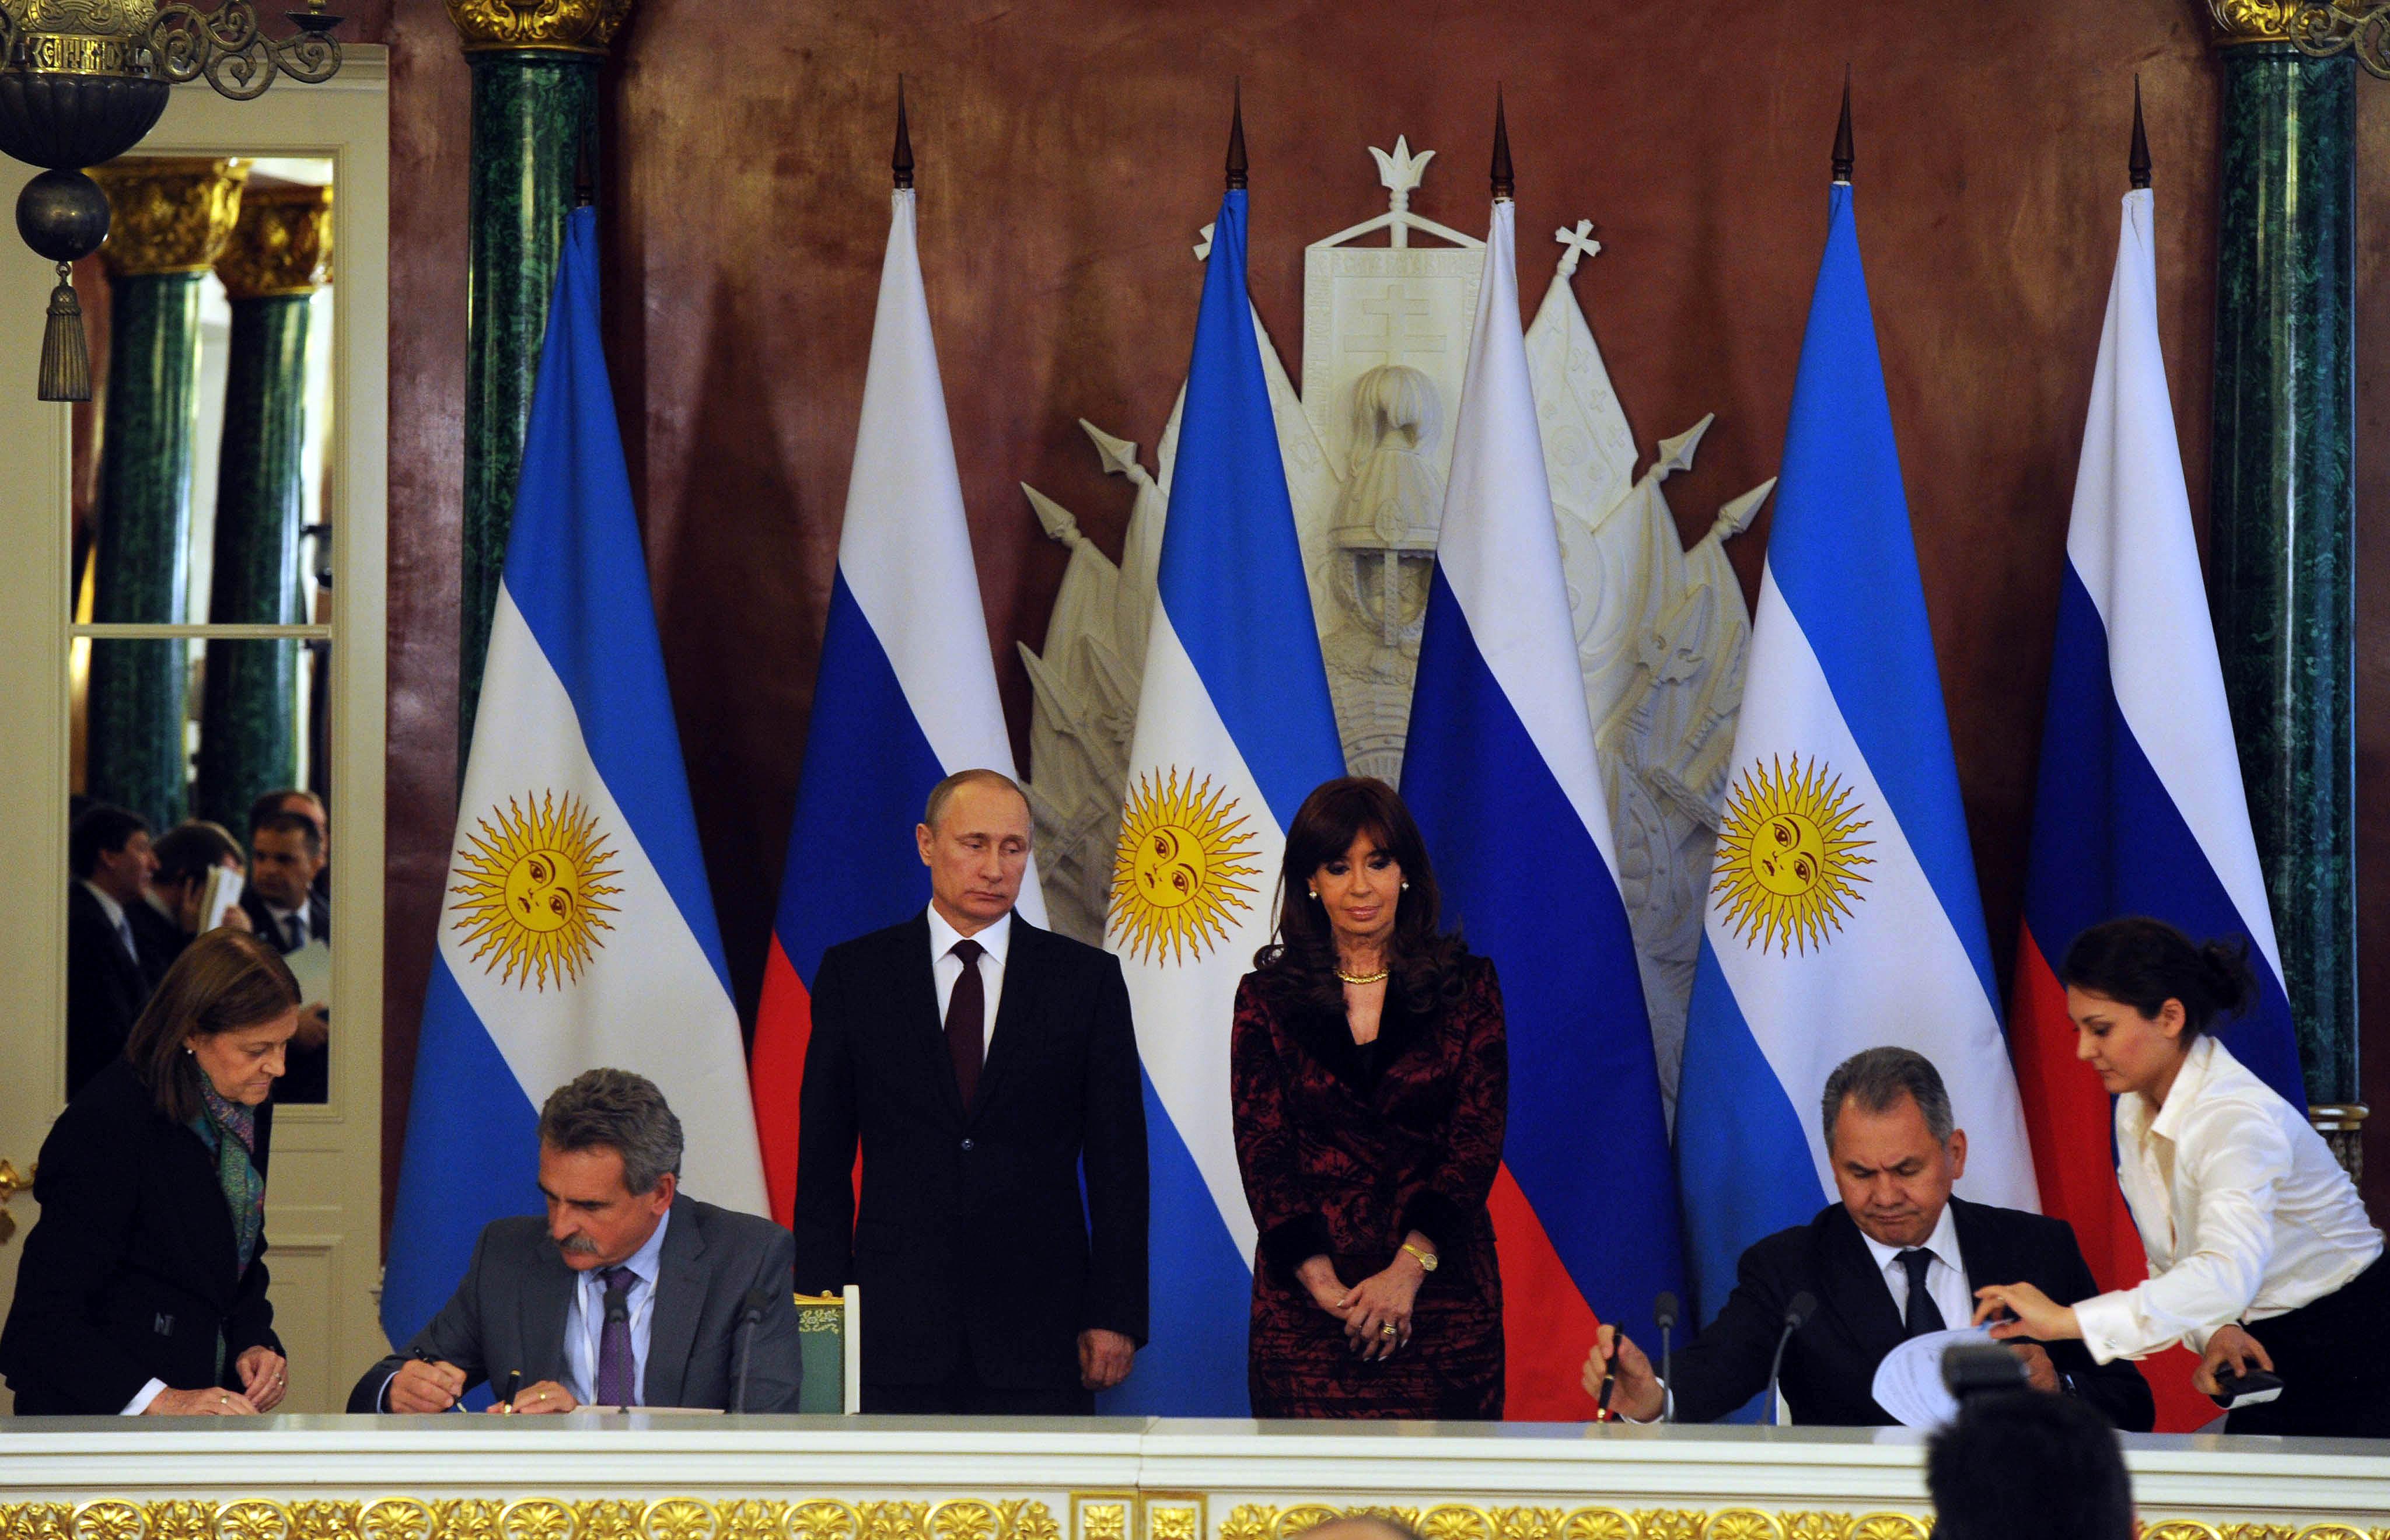 Acuerdos bilaterales con Rusia.